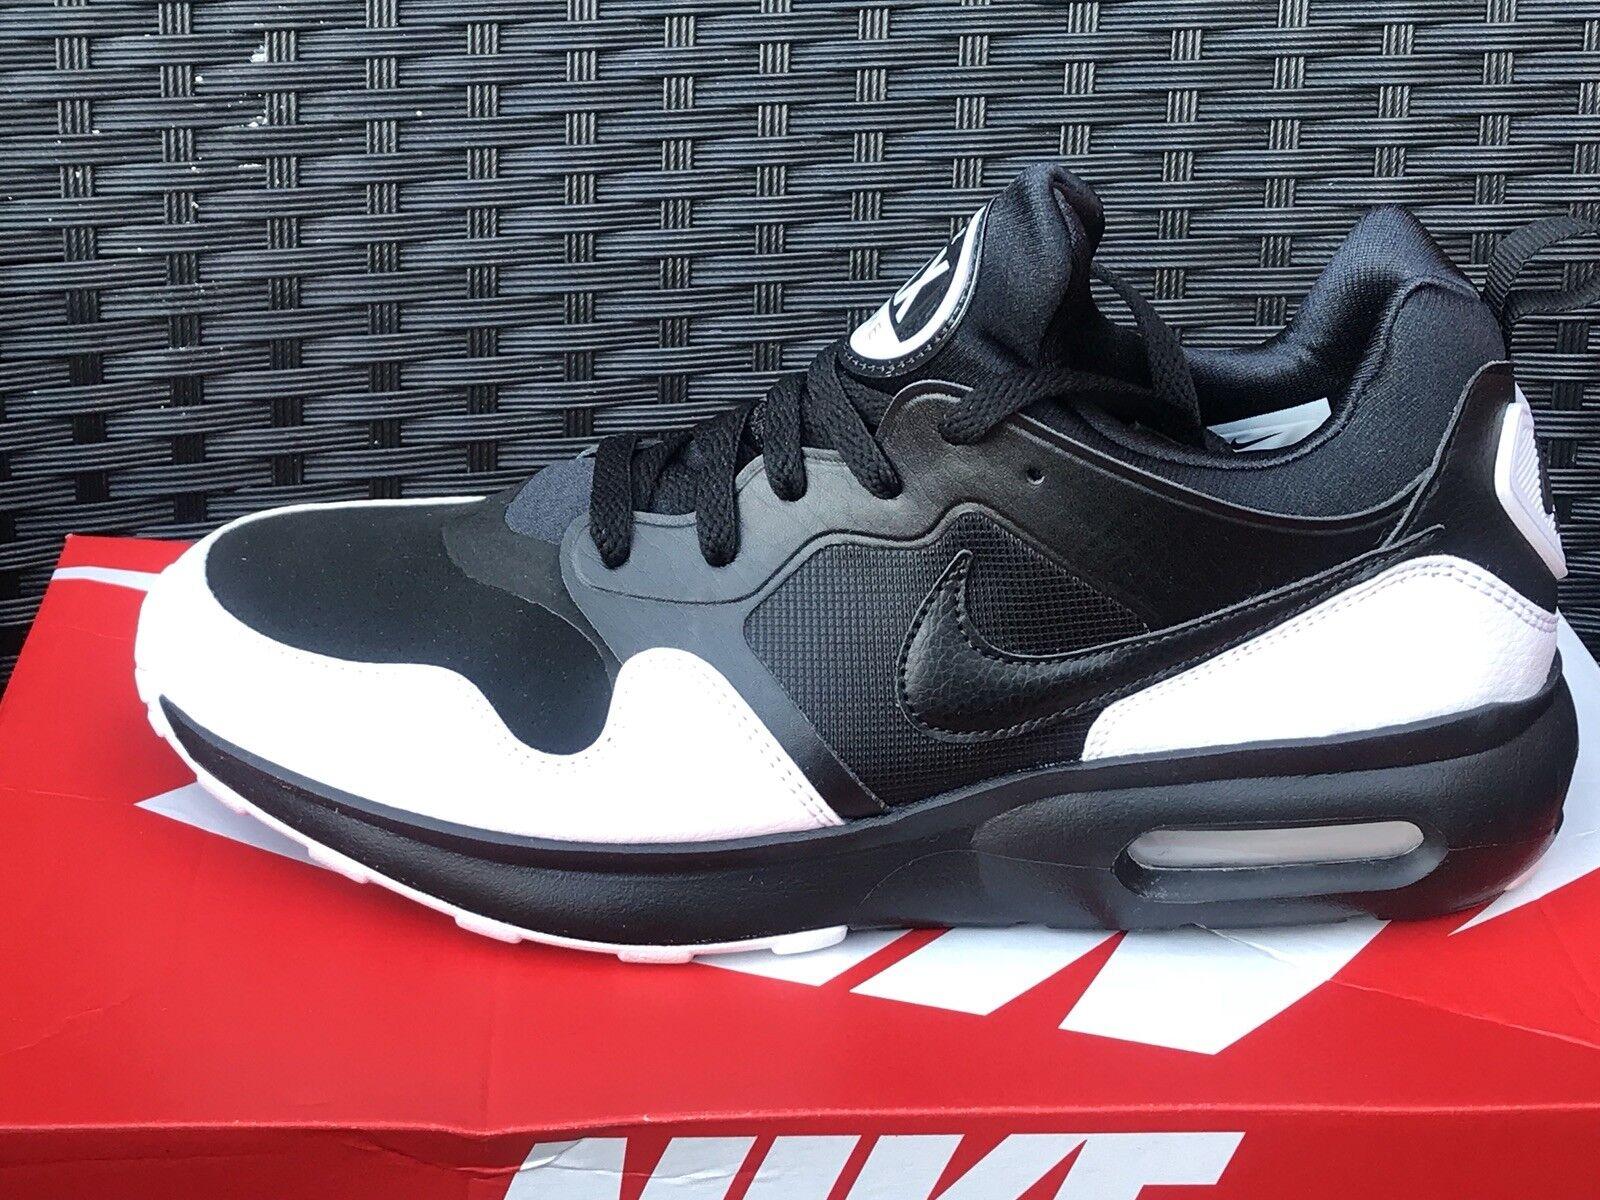 Nike Air Max Prime SL 10 Hommes Chaussures Trainers Uk 10 SL Eur 45 fb947e